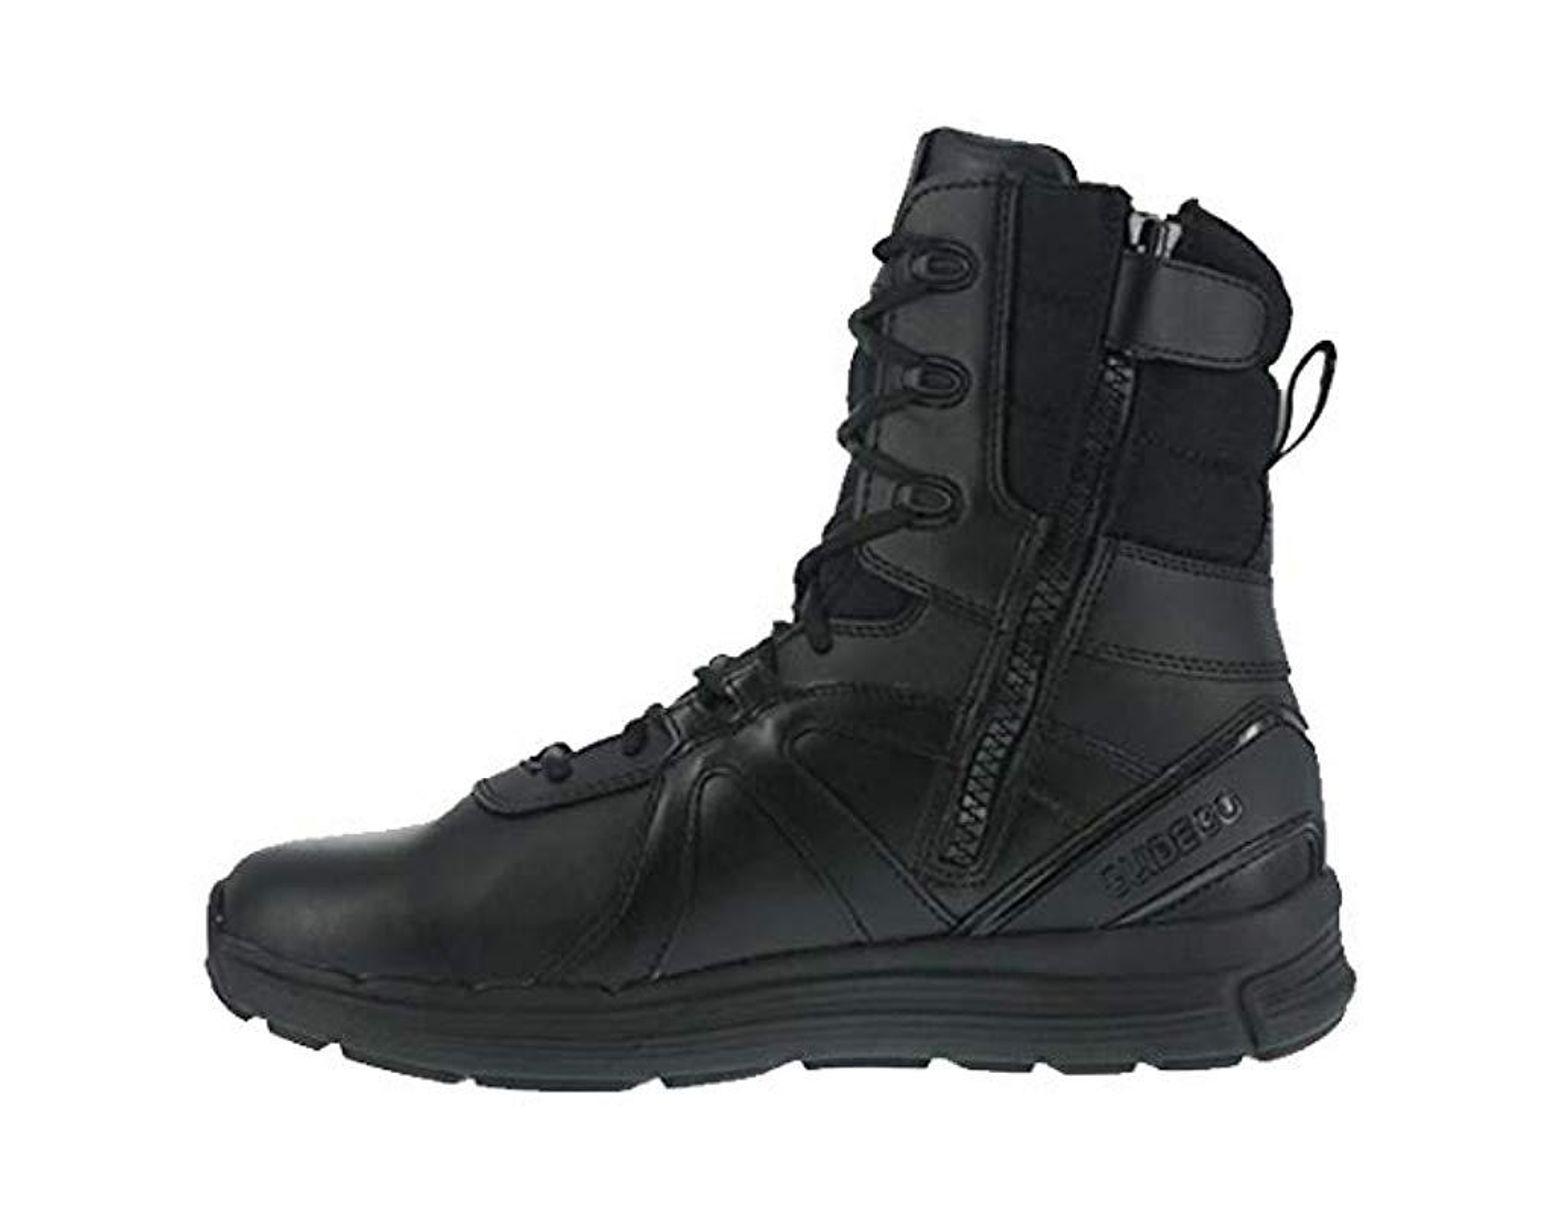 5cbf53490f5 Men's Rb8444 Guide Tactical 8